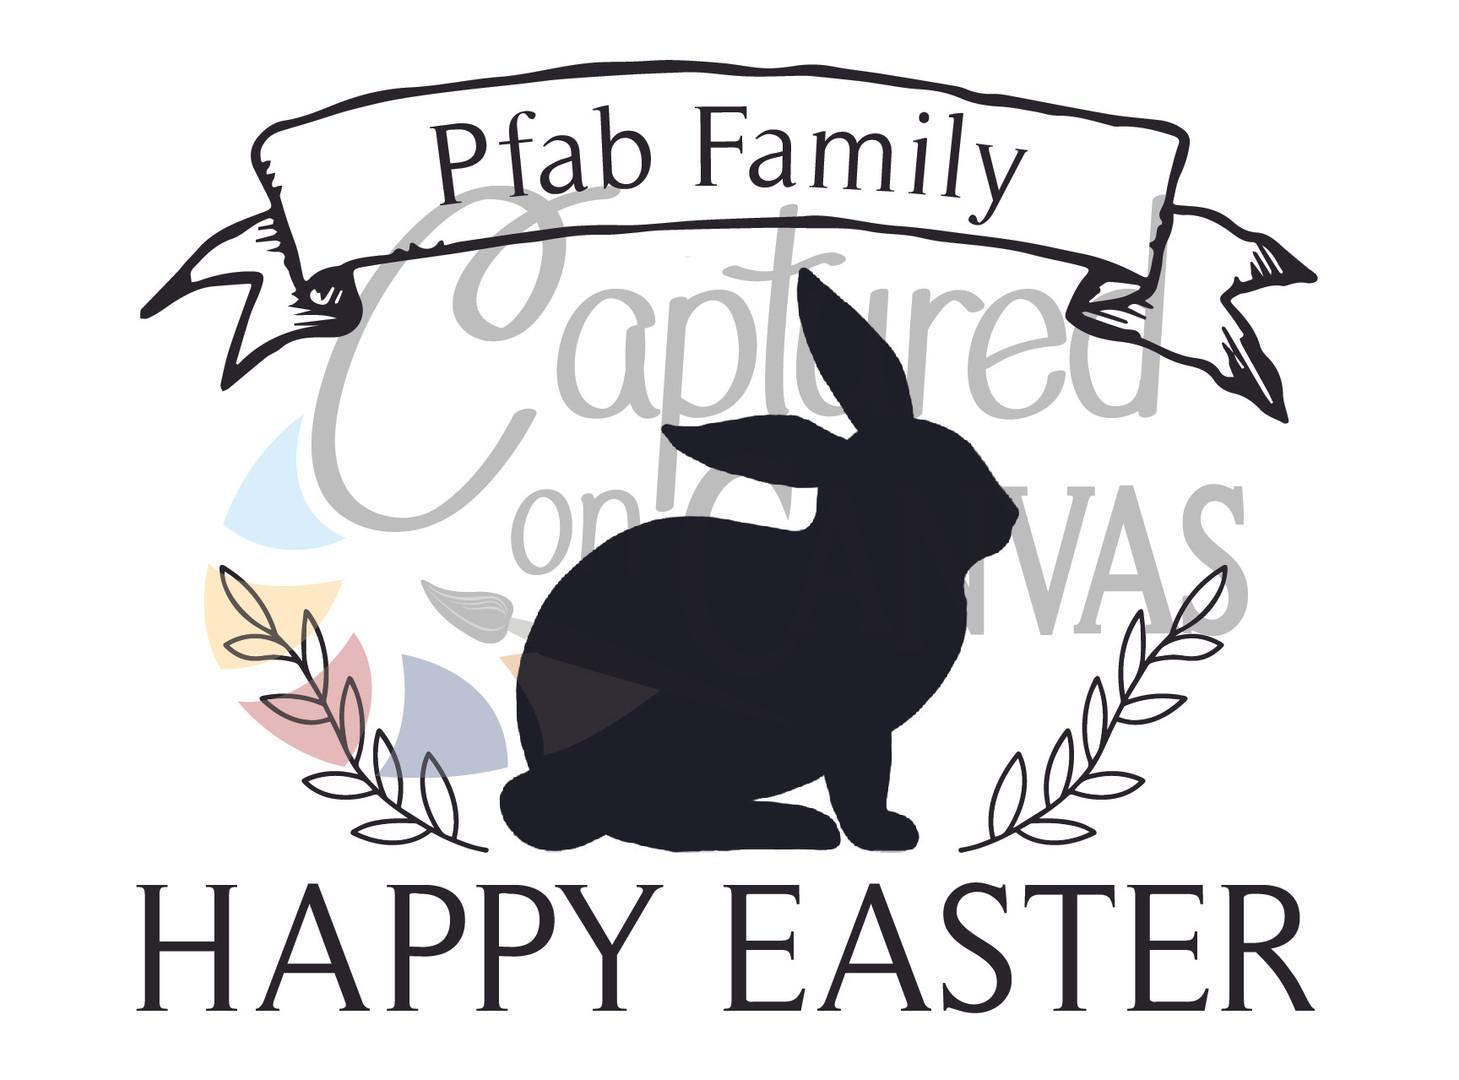 Happy Eatser Family-01.jpg